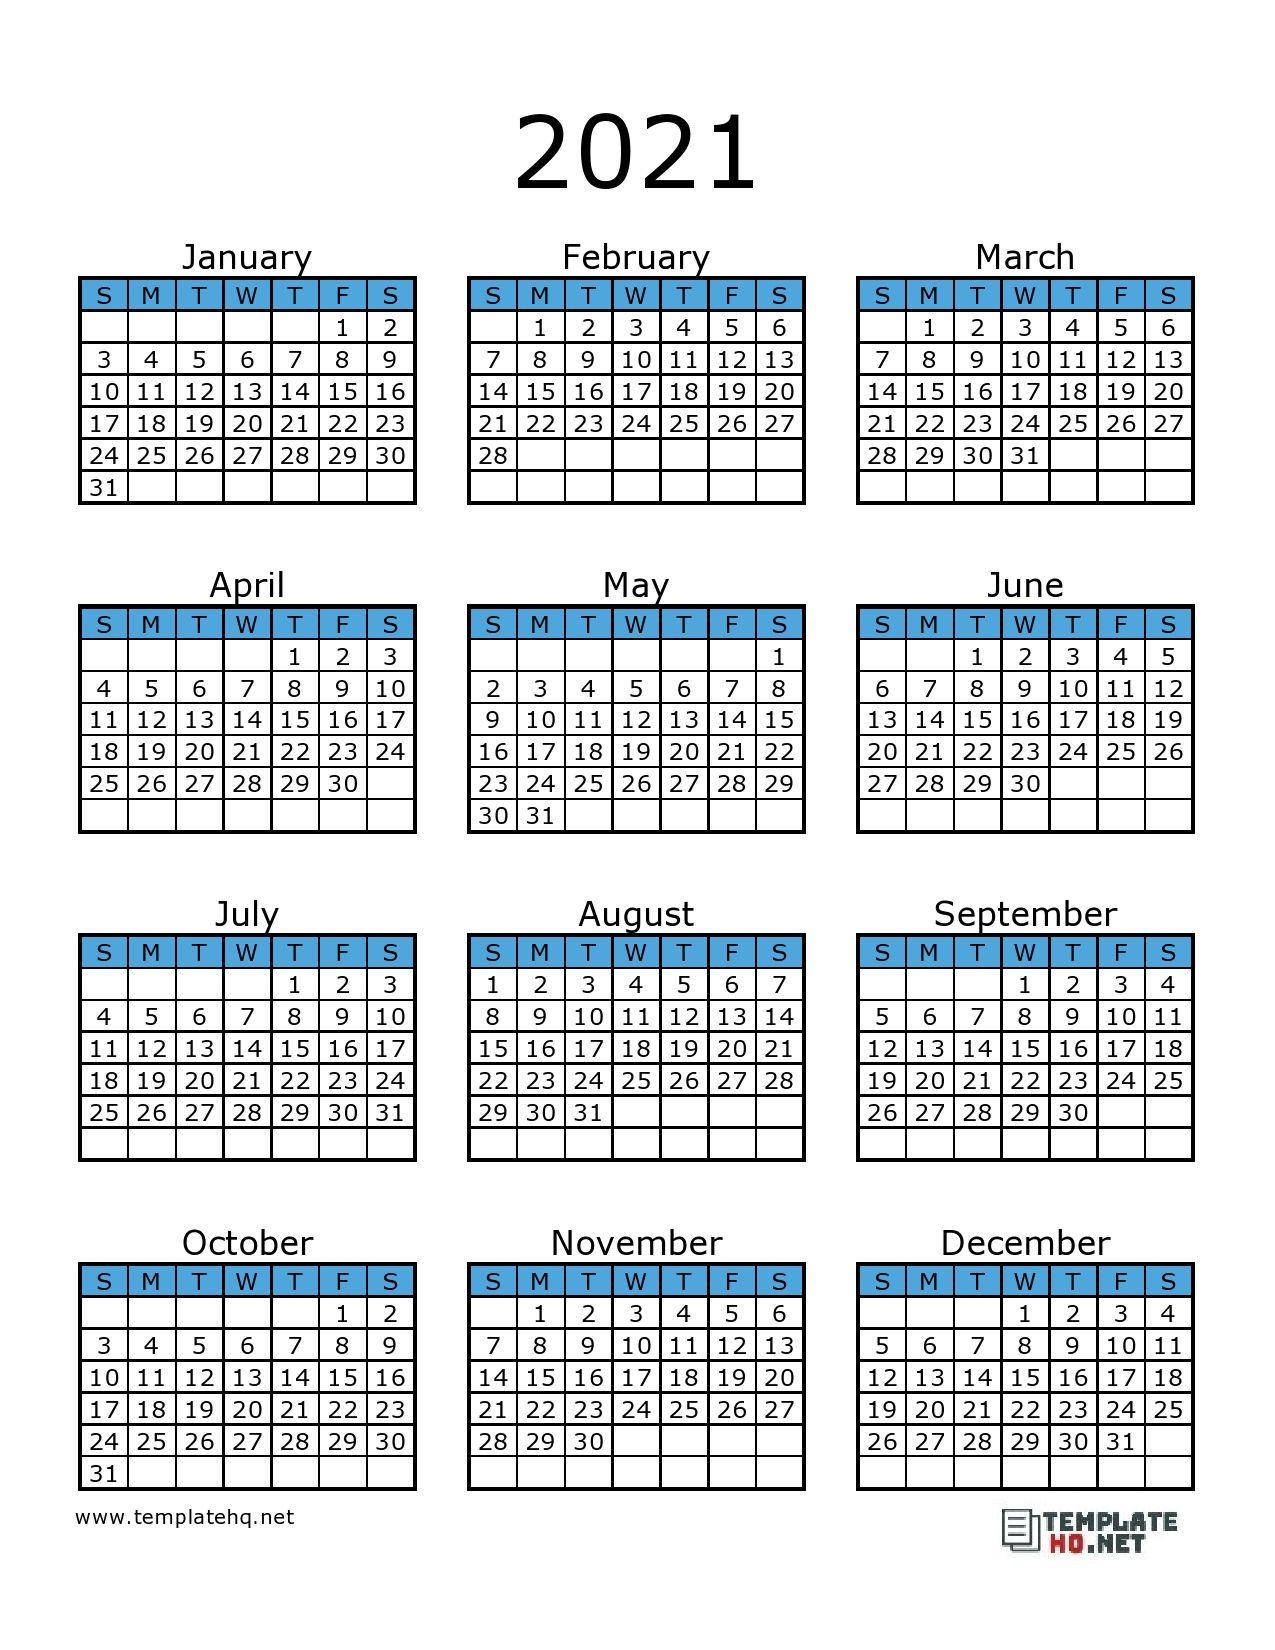 2021 Calendar Printable 03 2021 Calendar Printable Calendar Design Calendar Printables